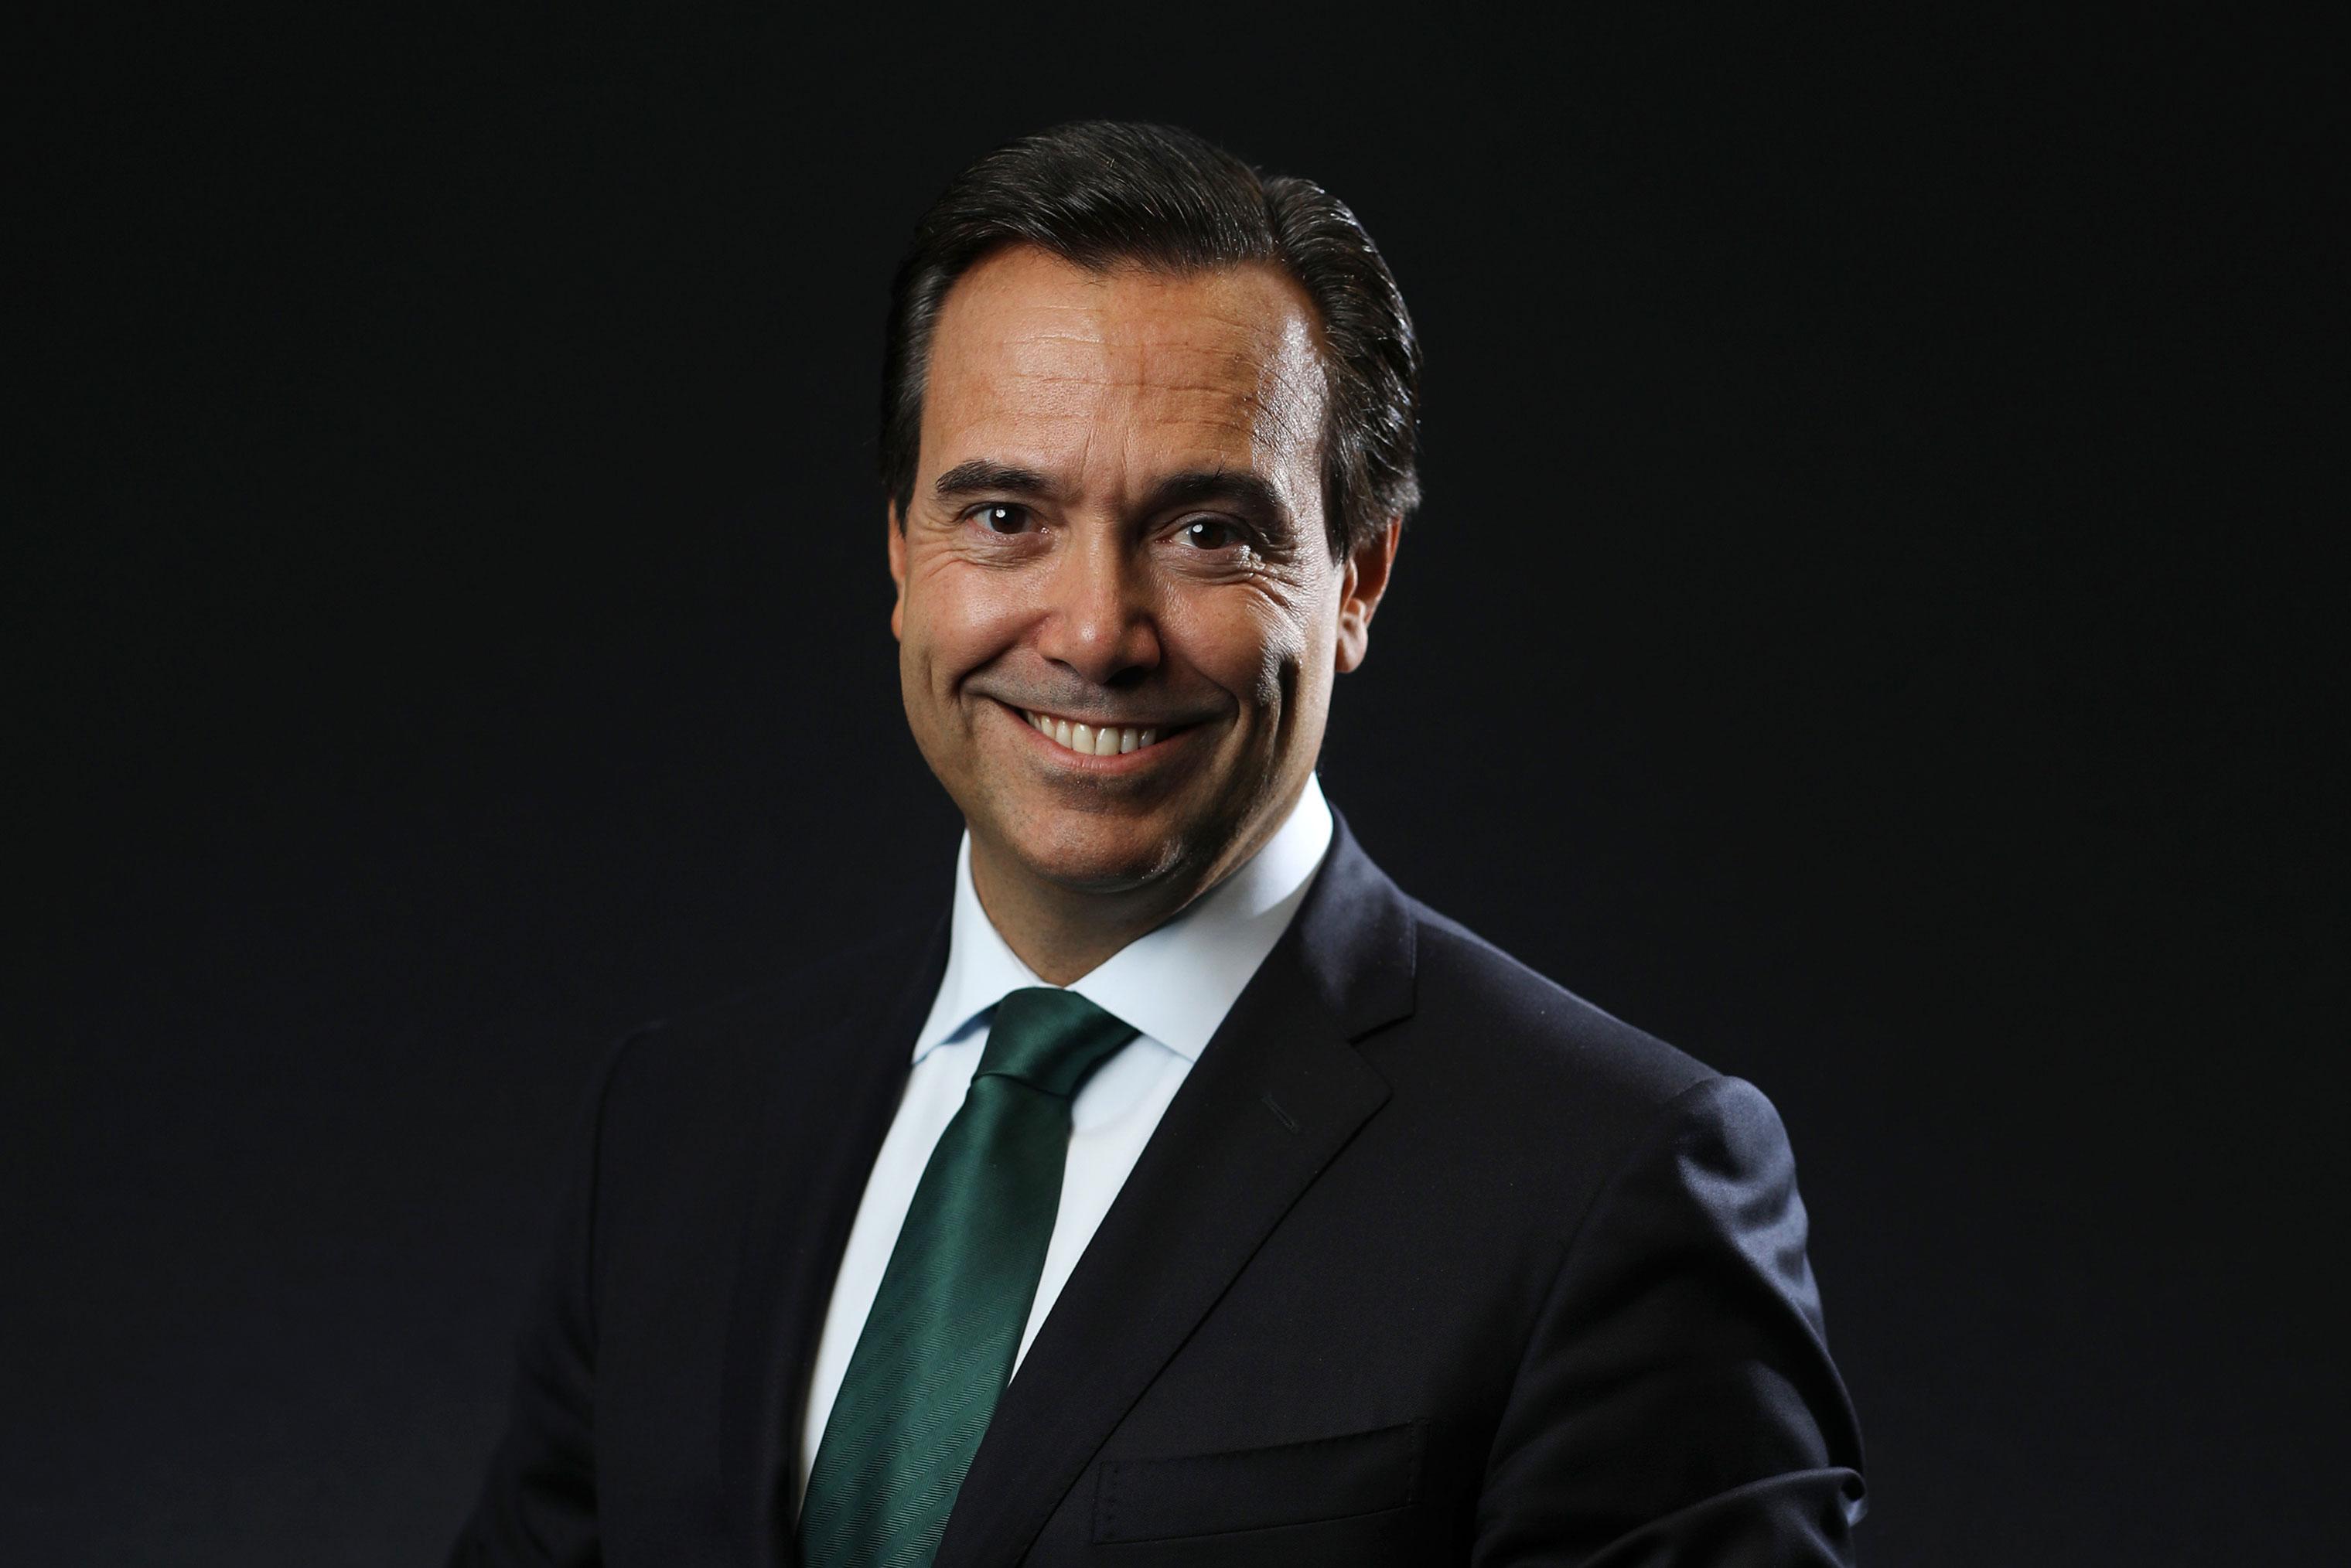 WGC05.19-41-Antonio-Horta-Osorio